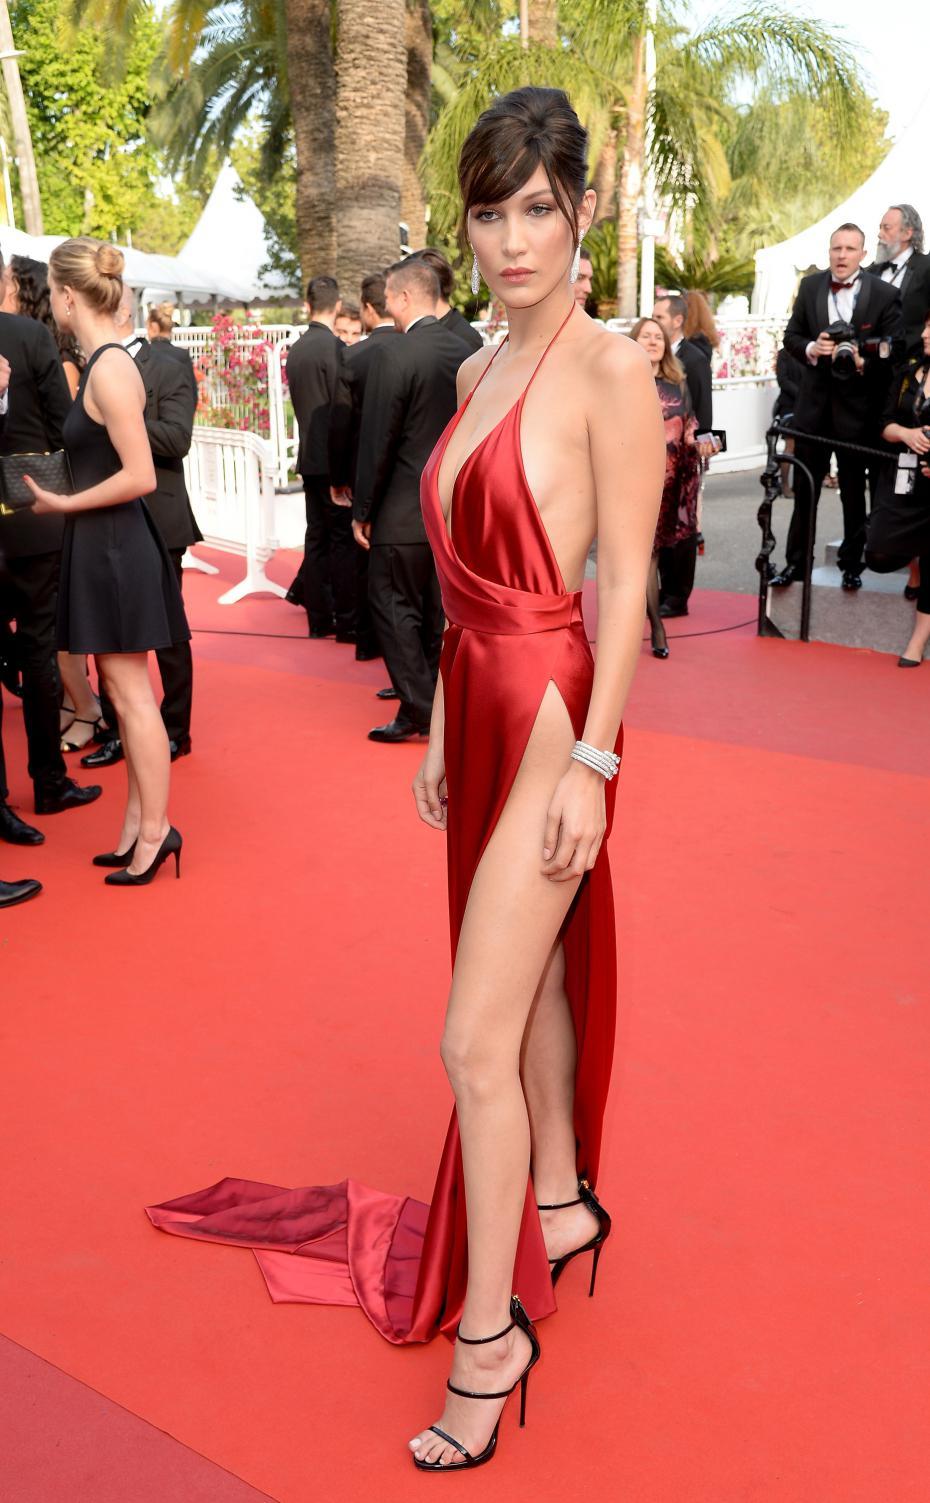 Bella Hadid en robe fendue très décolletée